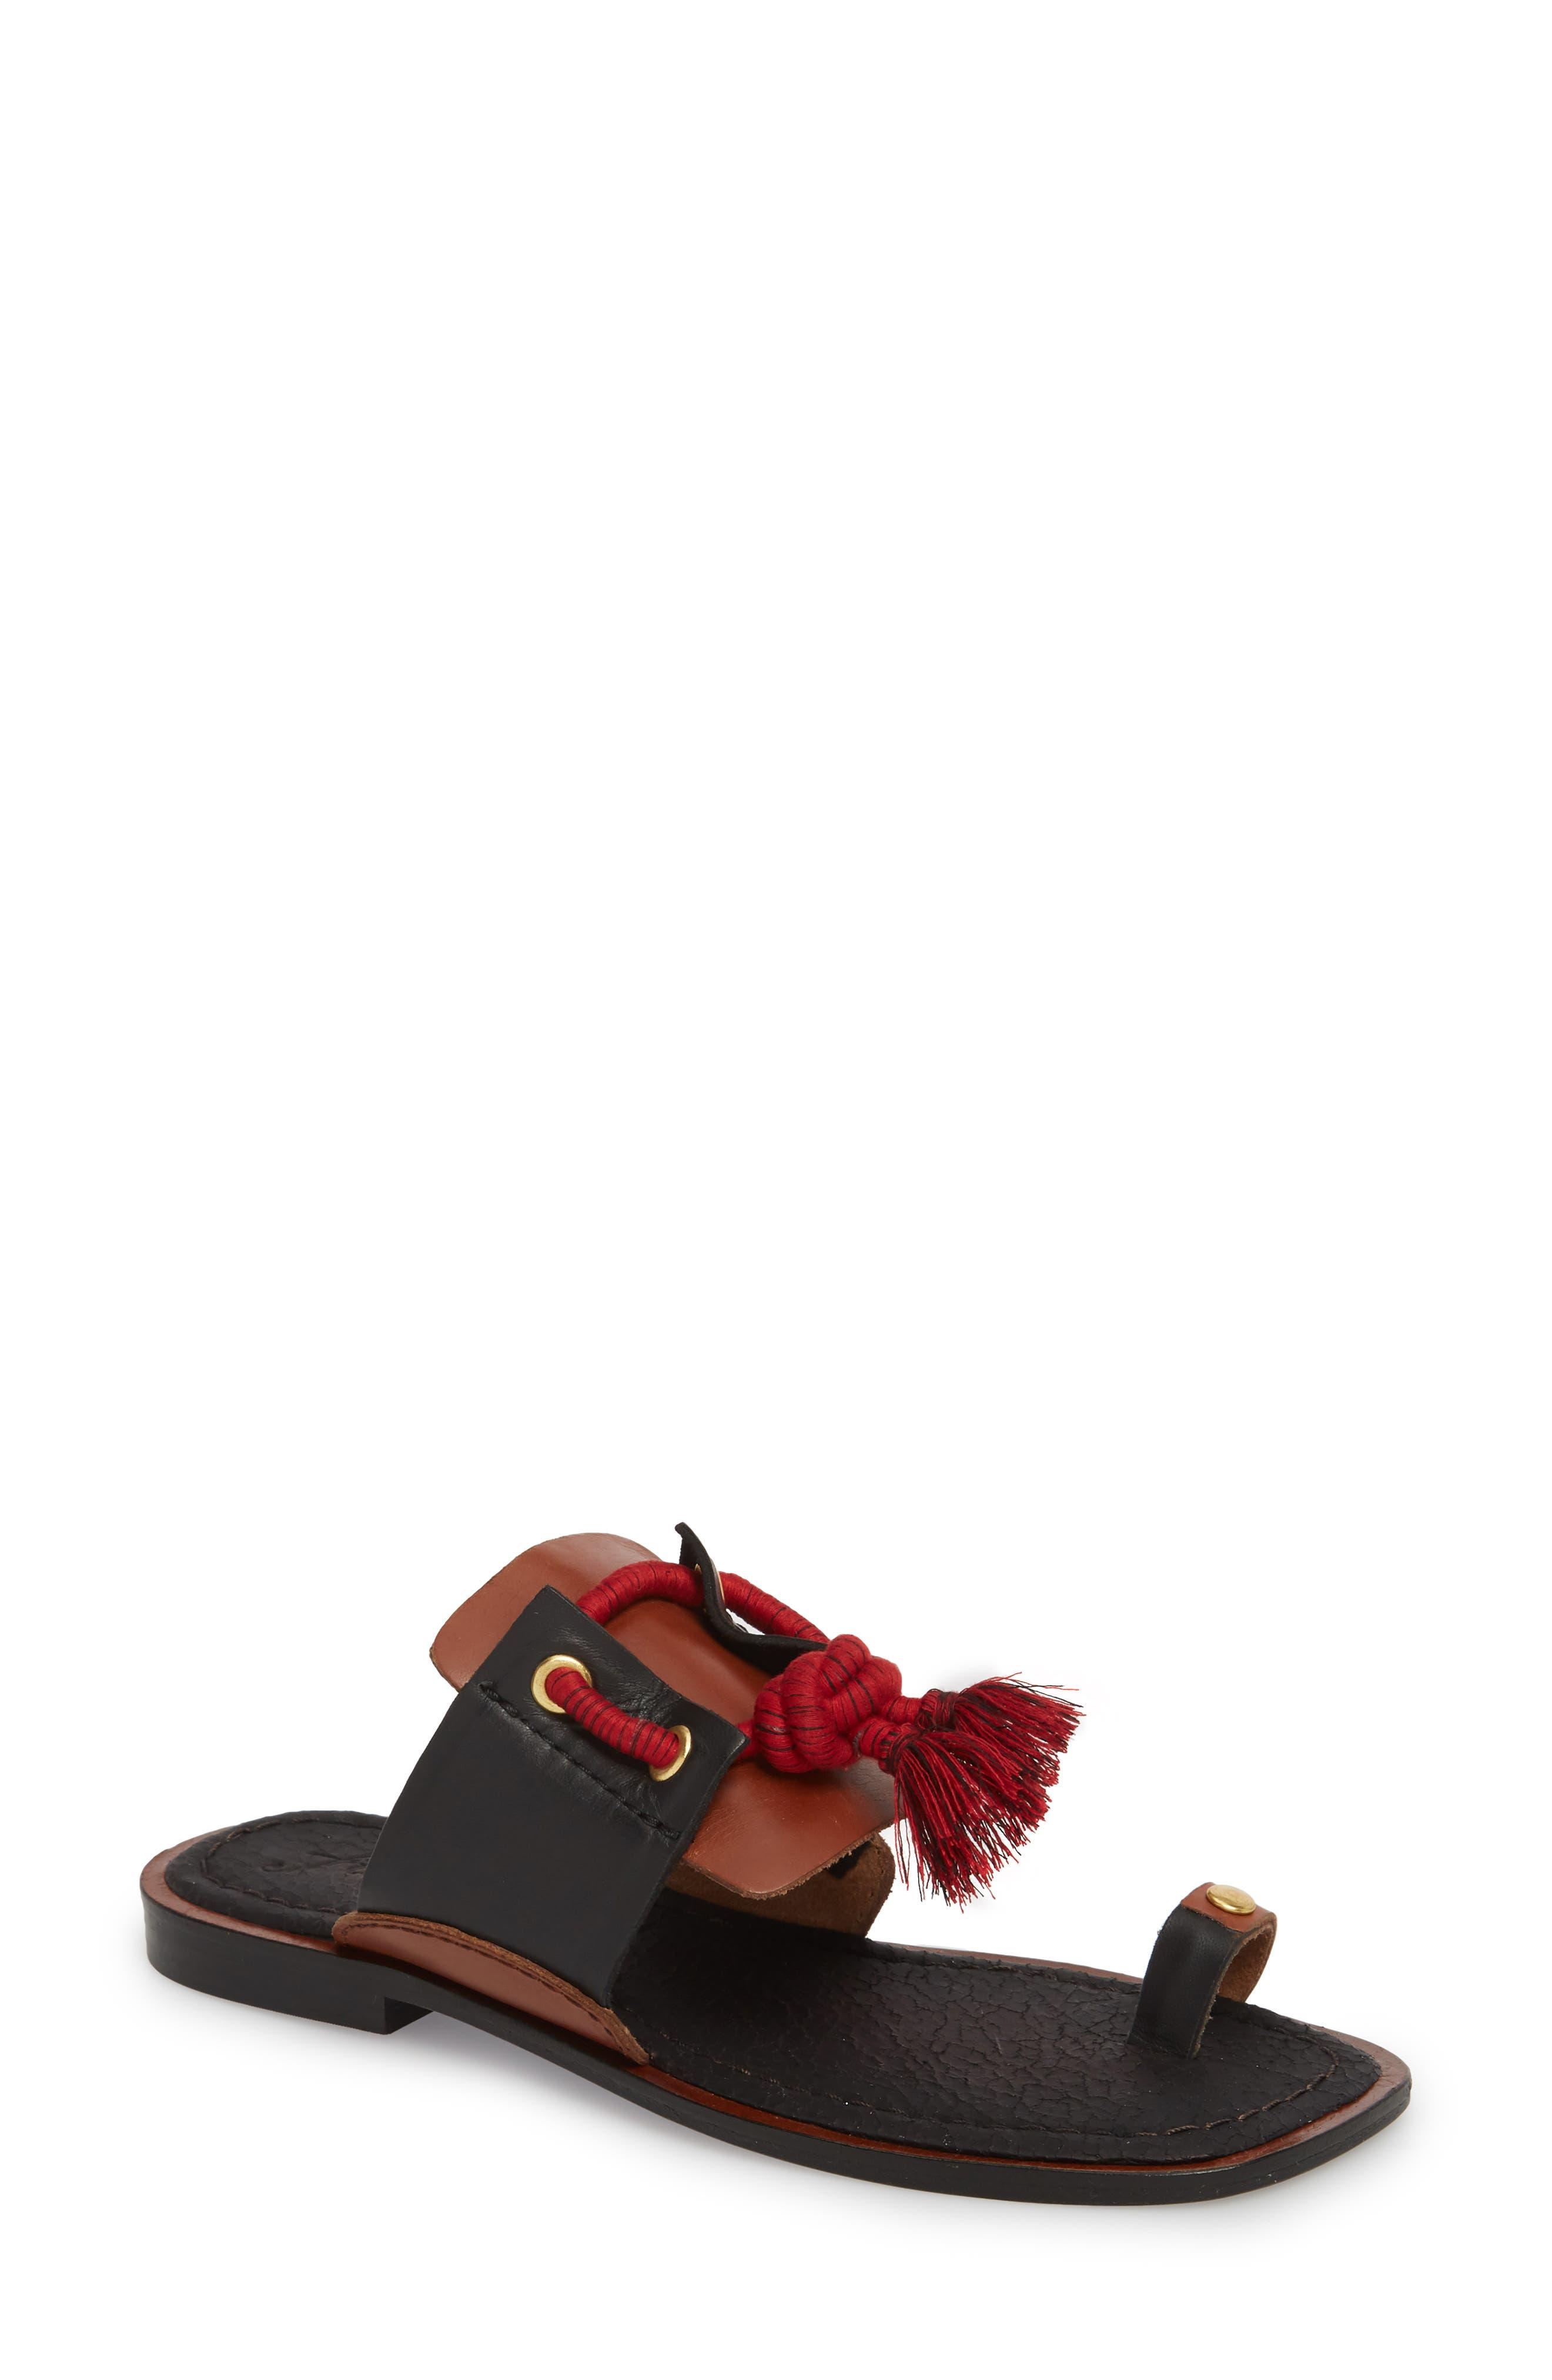 Maui Tasseled Slide Sandal,                             Main thumbnail 1, color,                             001